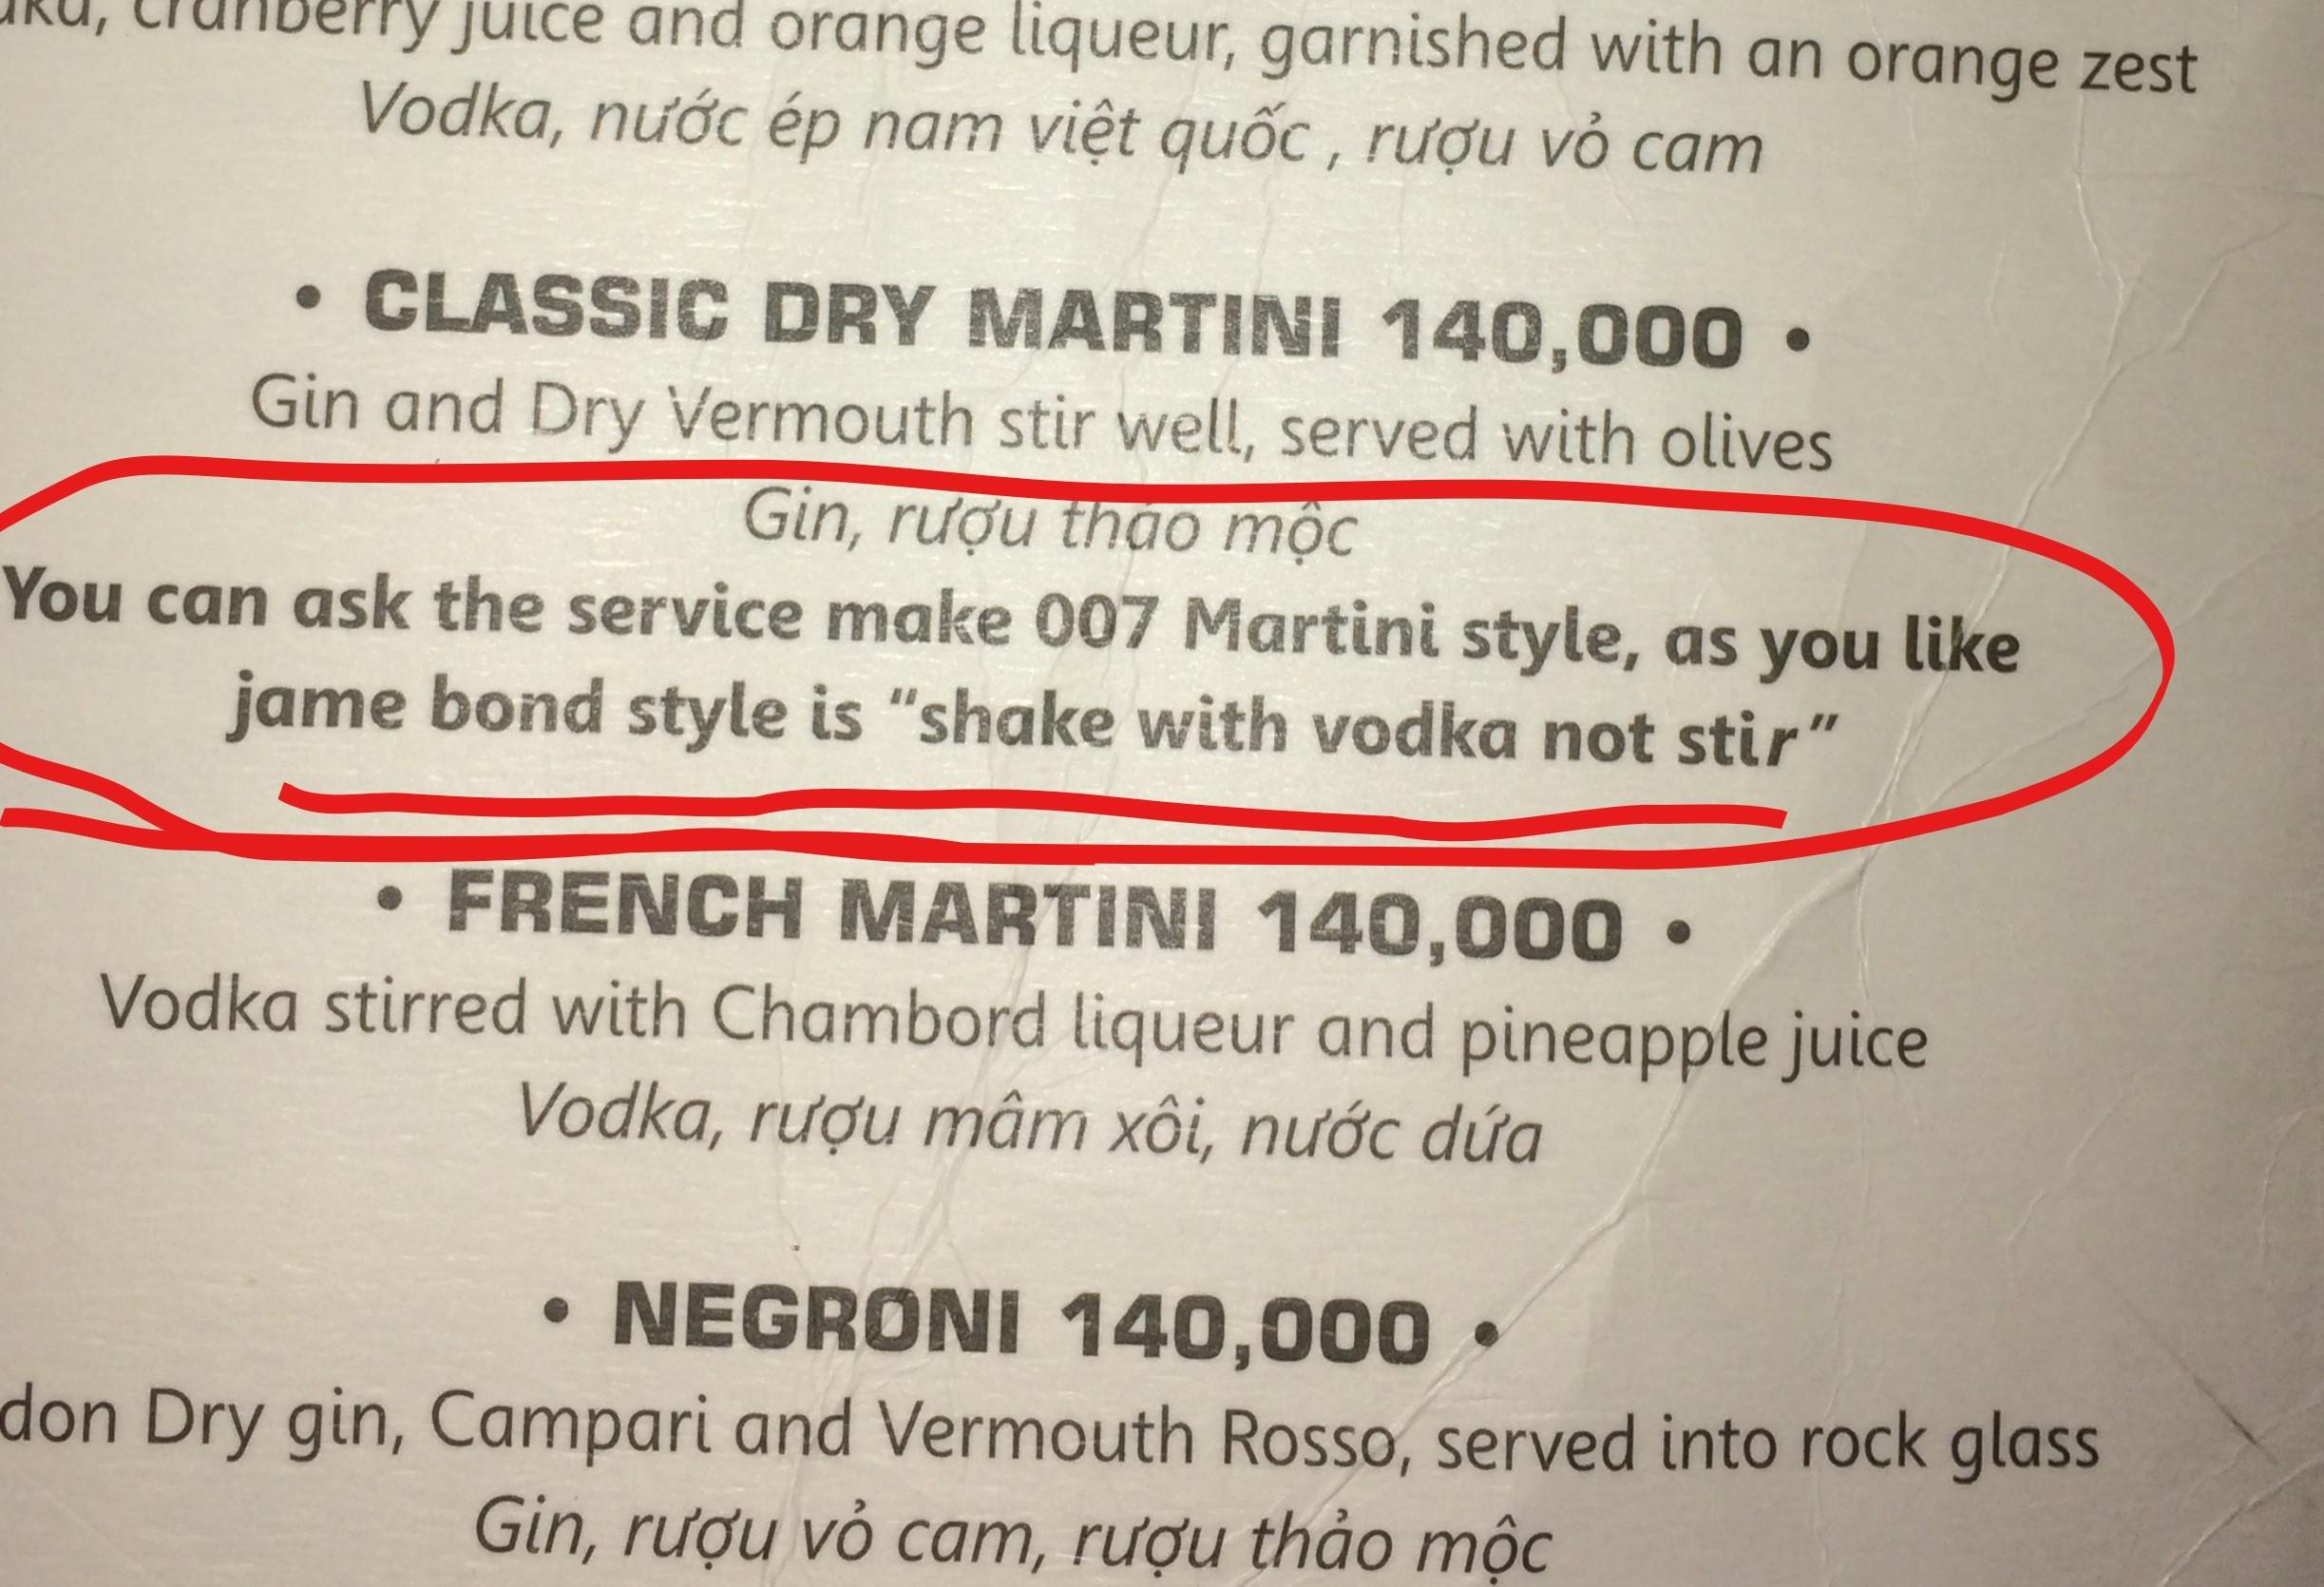 Jame Bond style is shake with vodka....not stir! Da Nang, Vietnam